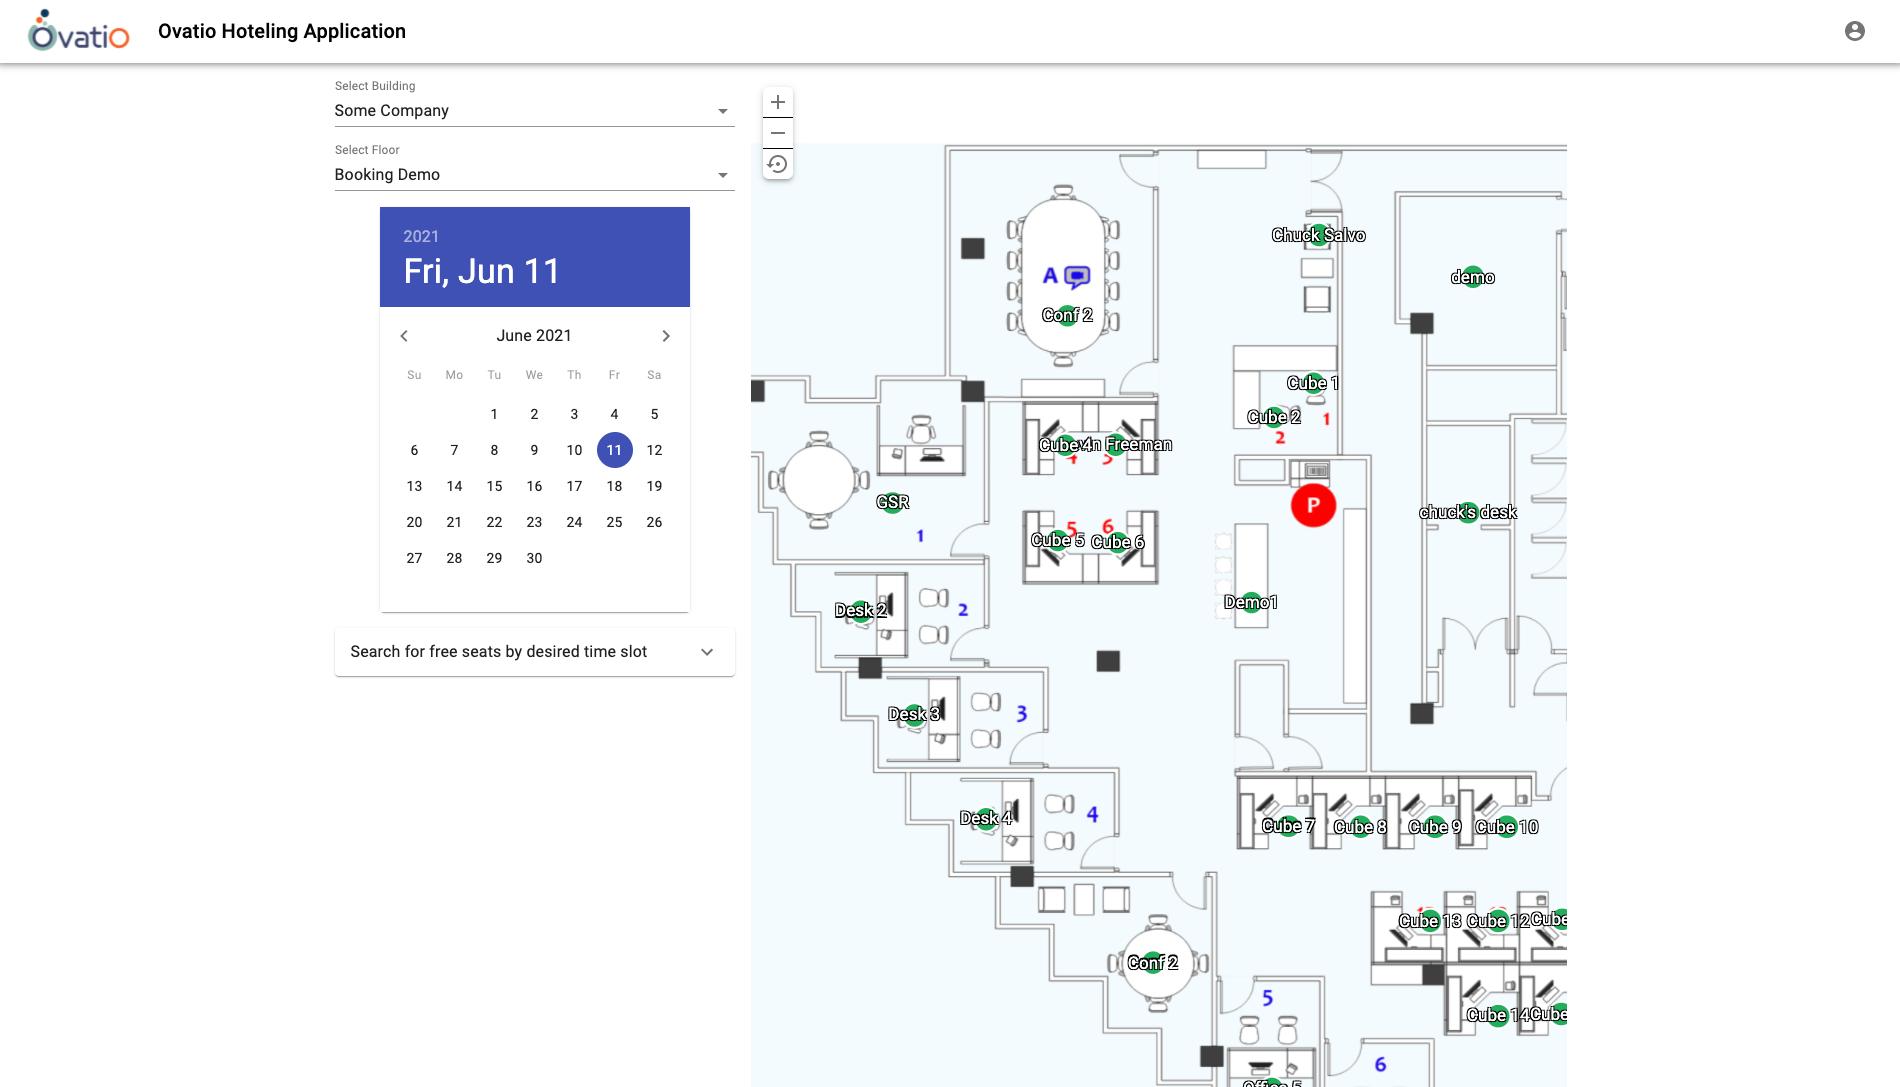 Ovatio Hoteling App UI